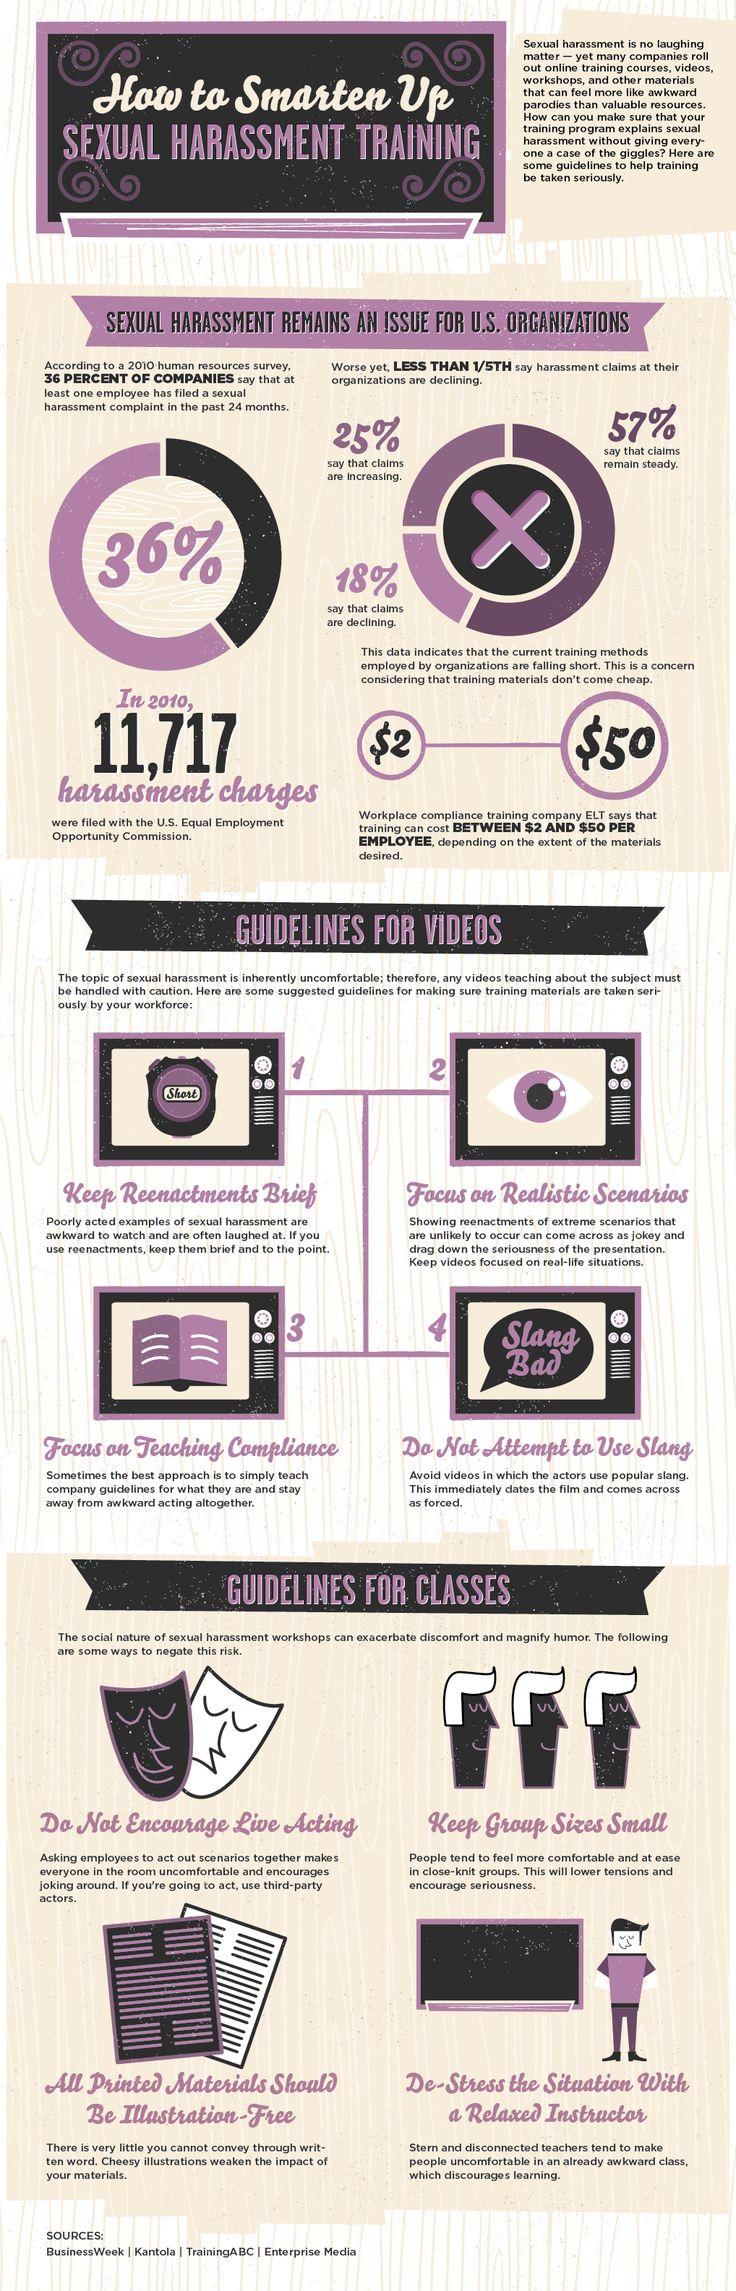 training, harassment, sexual harassment, anti-harassment, harassment training, infographic